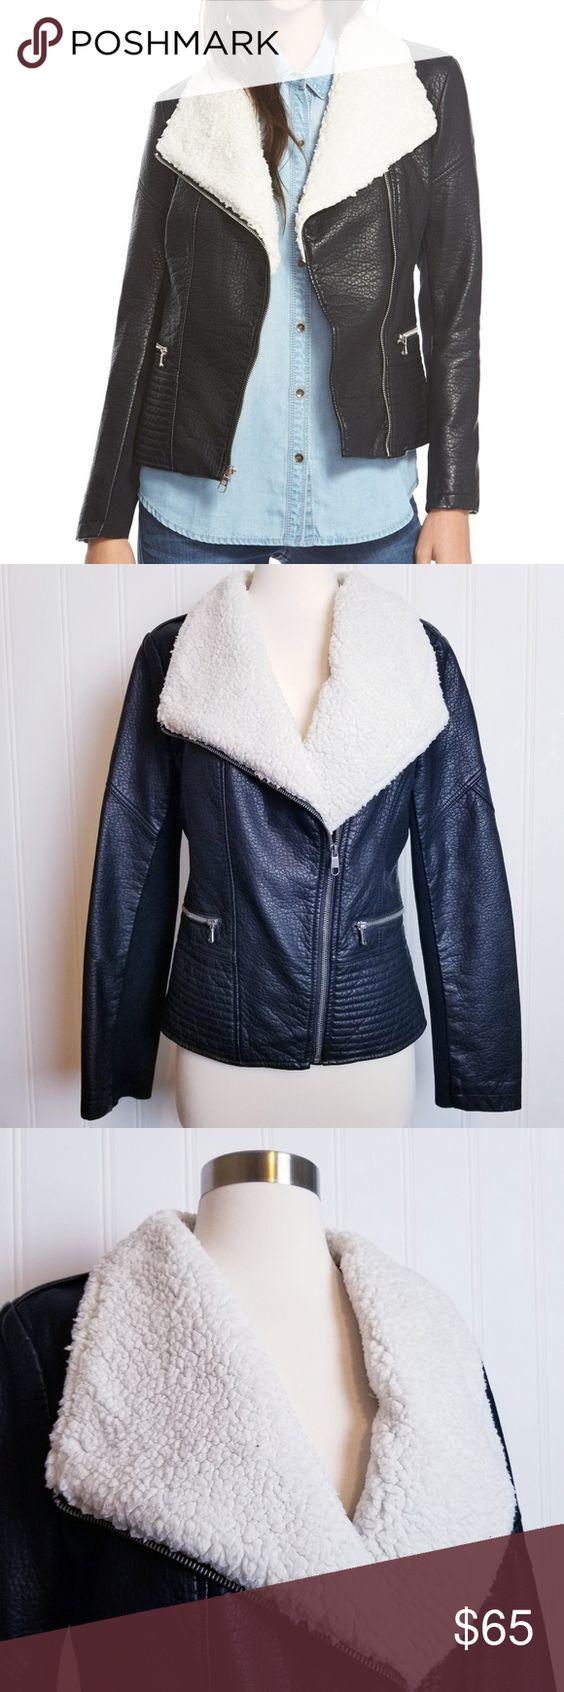 Jessica Simpson Black Faux Leather Moto Jacket Jessica Simpson Women S Black Faux Leather Jack Black Faux Leather Moto Jacket Fashion Black Faux Leather Jacket